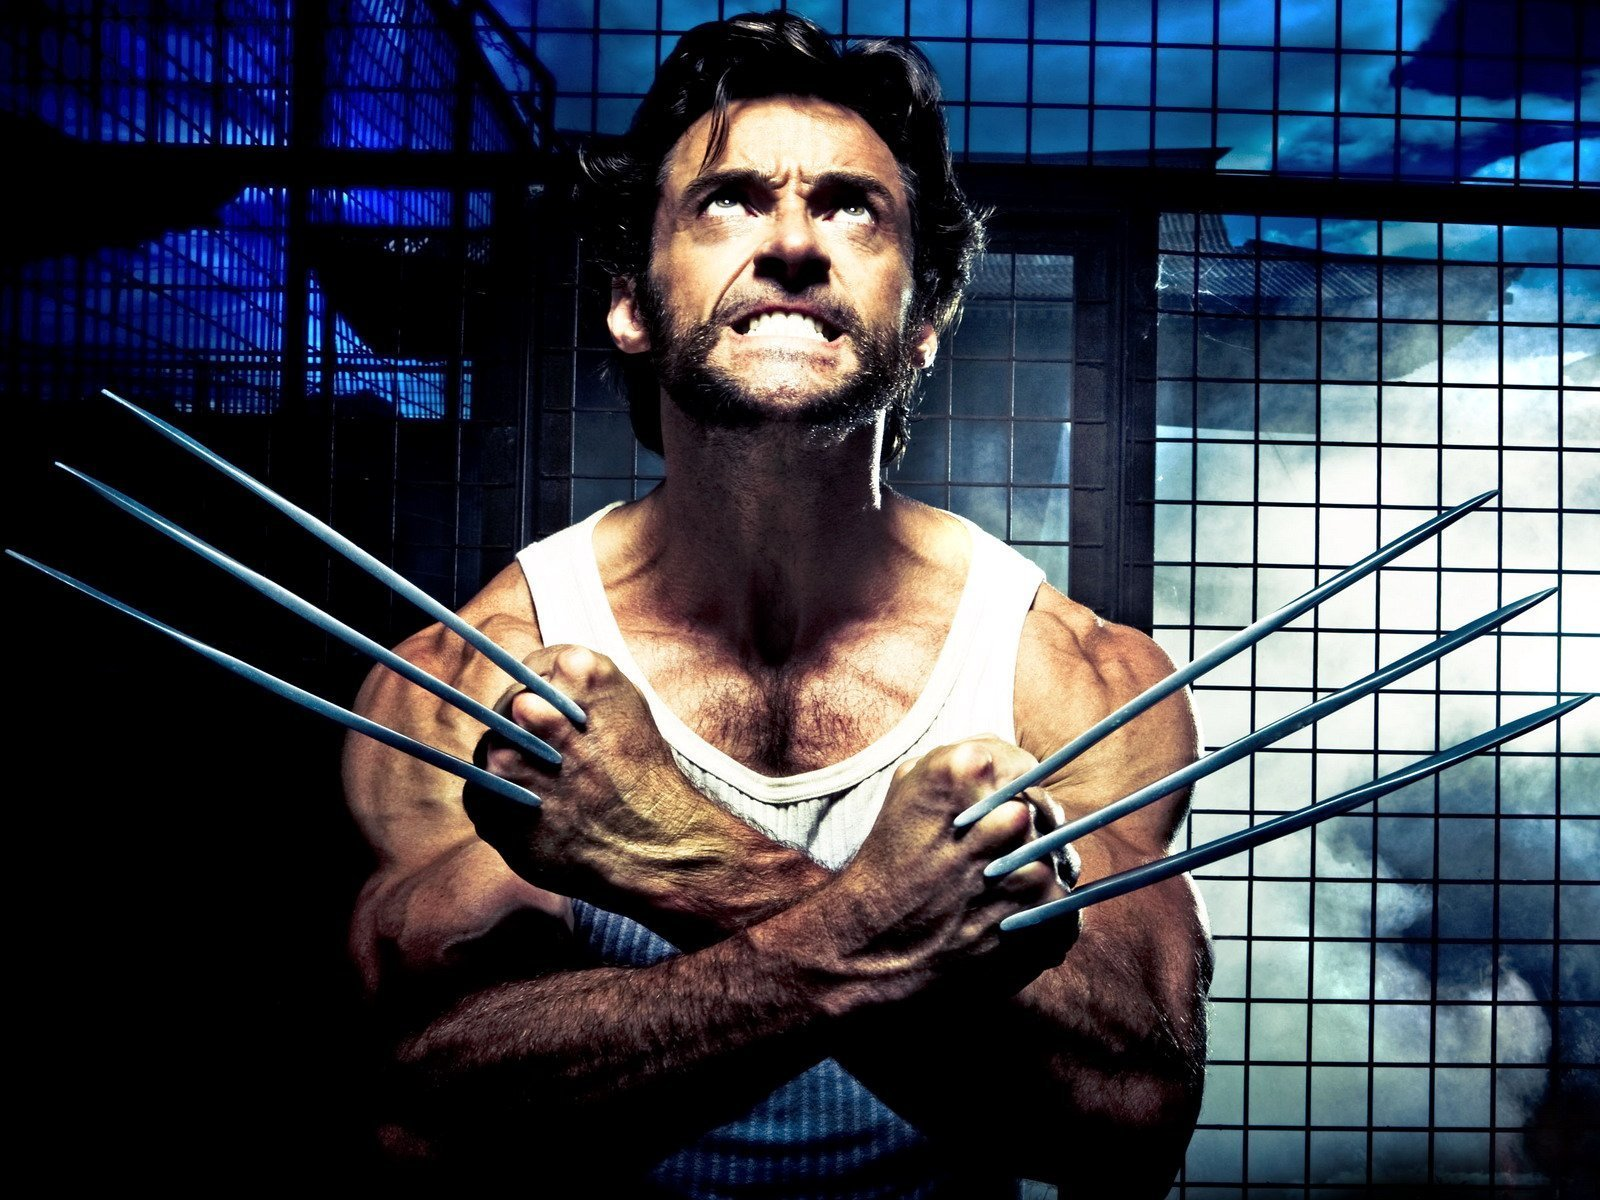 X-Men Origins: Wolverine - Movies Wallpaper (5053726) - Fanpop